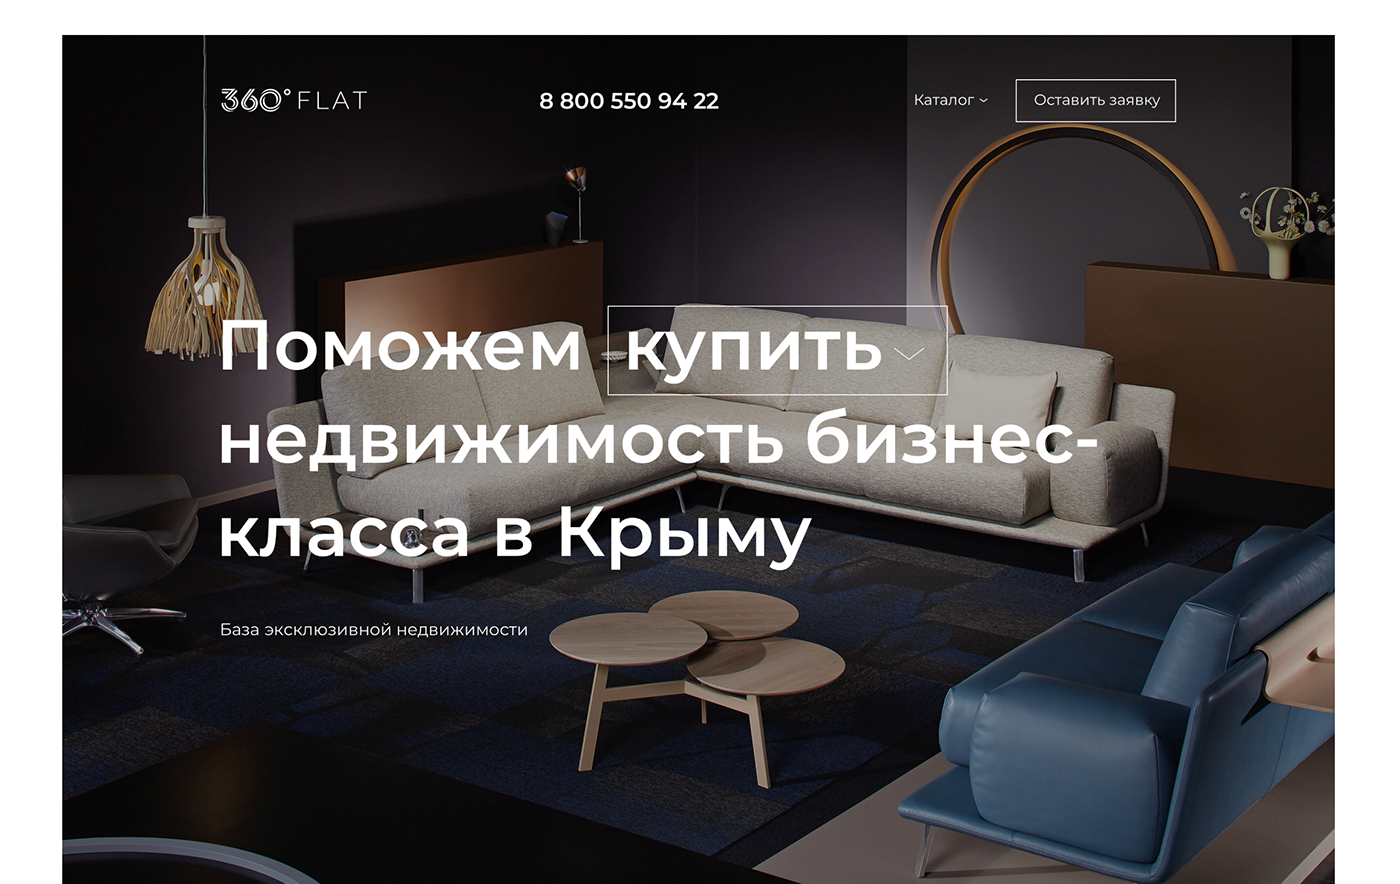 flat room Interior недвижимость интерьер квартира дом home house premium